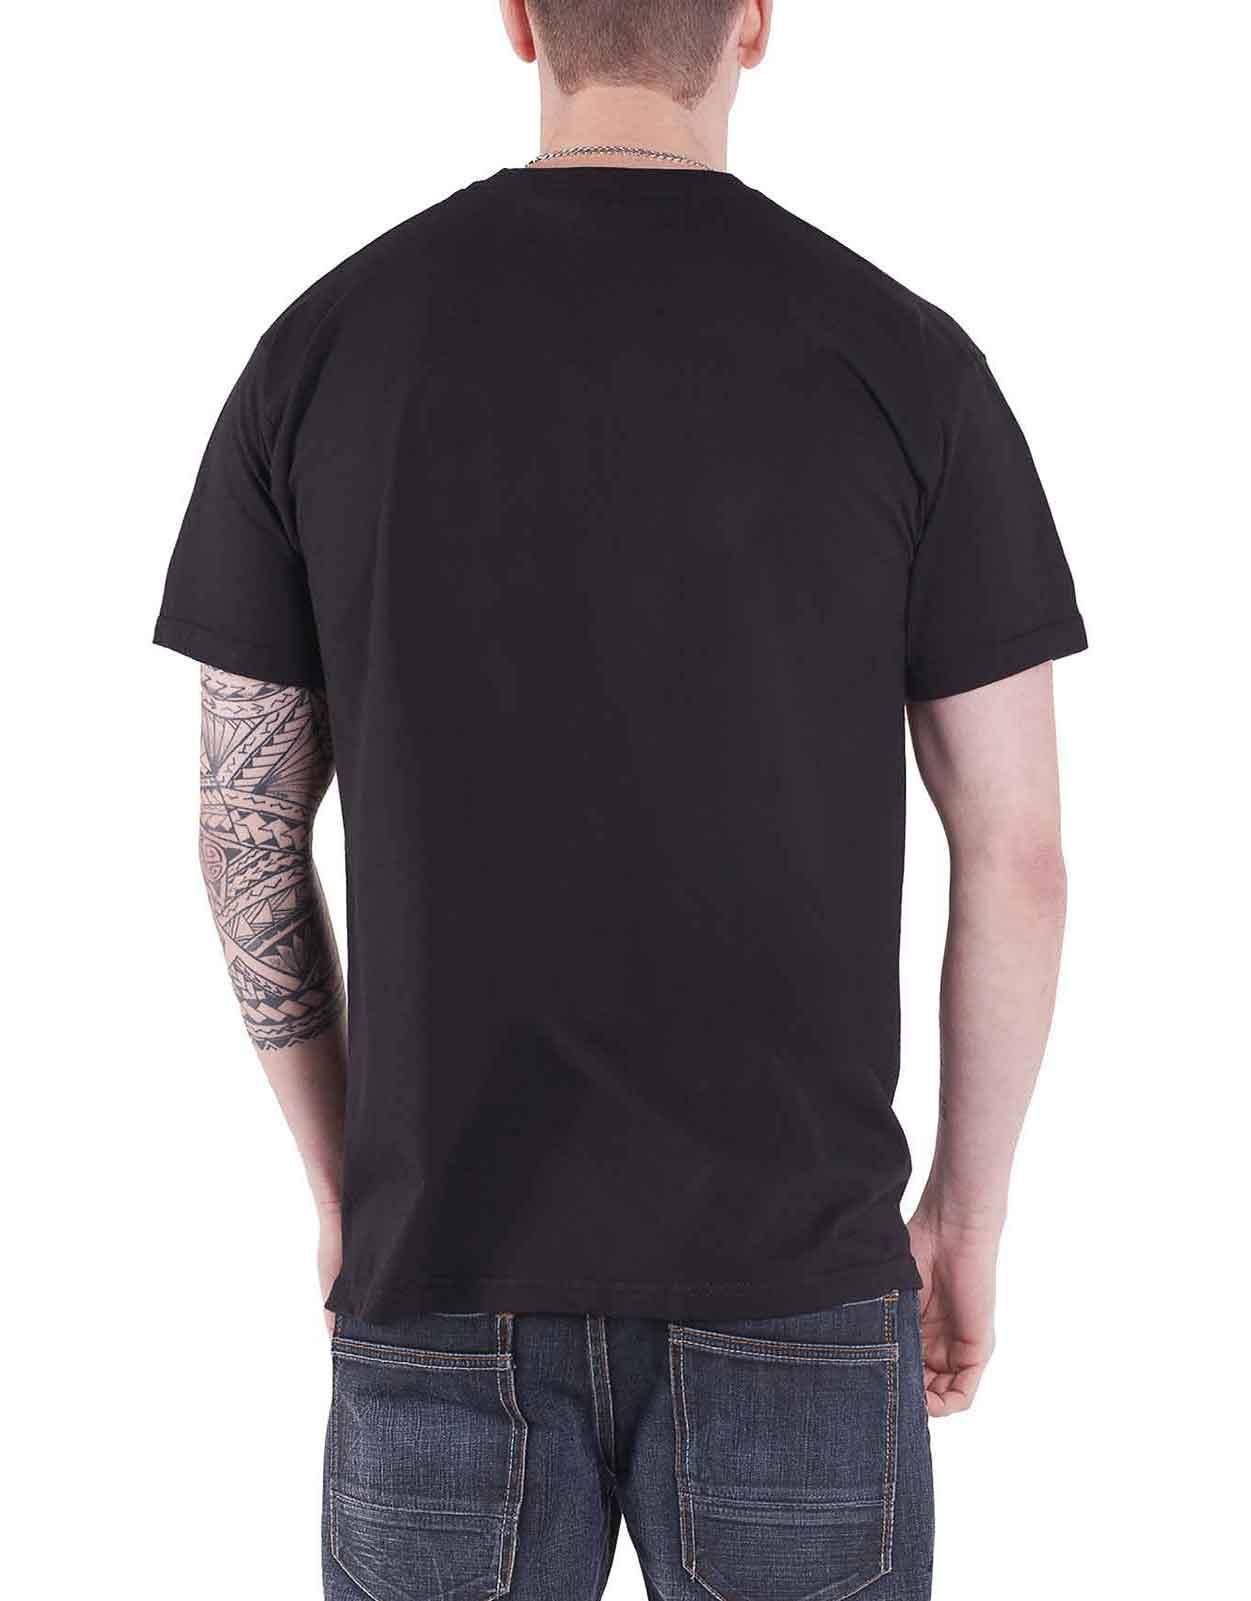 Motorhead-T-Shirt-Lemmy-RIP-England-warpig-clean-your-clock-official-new-mens Indexbild 5